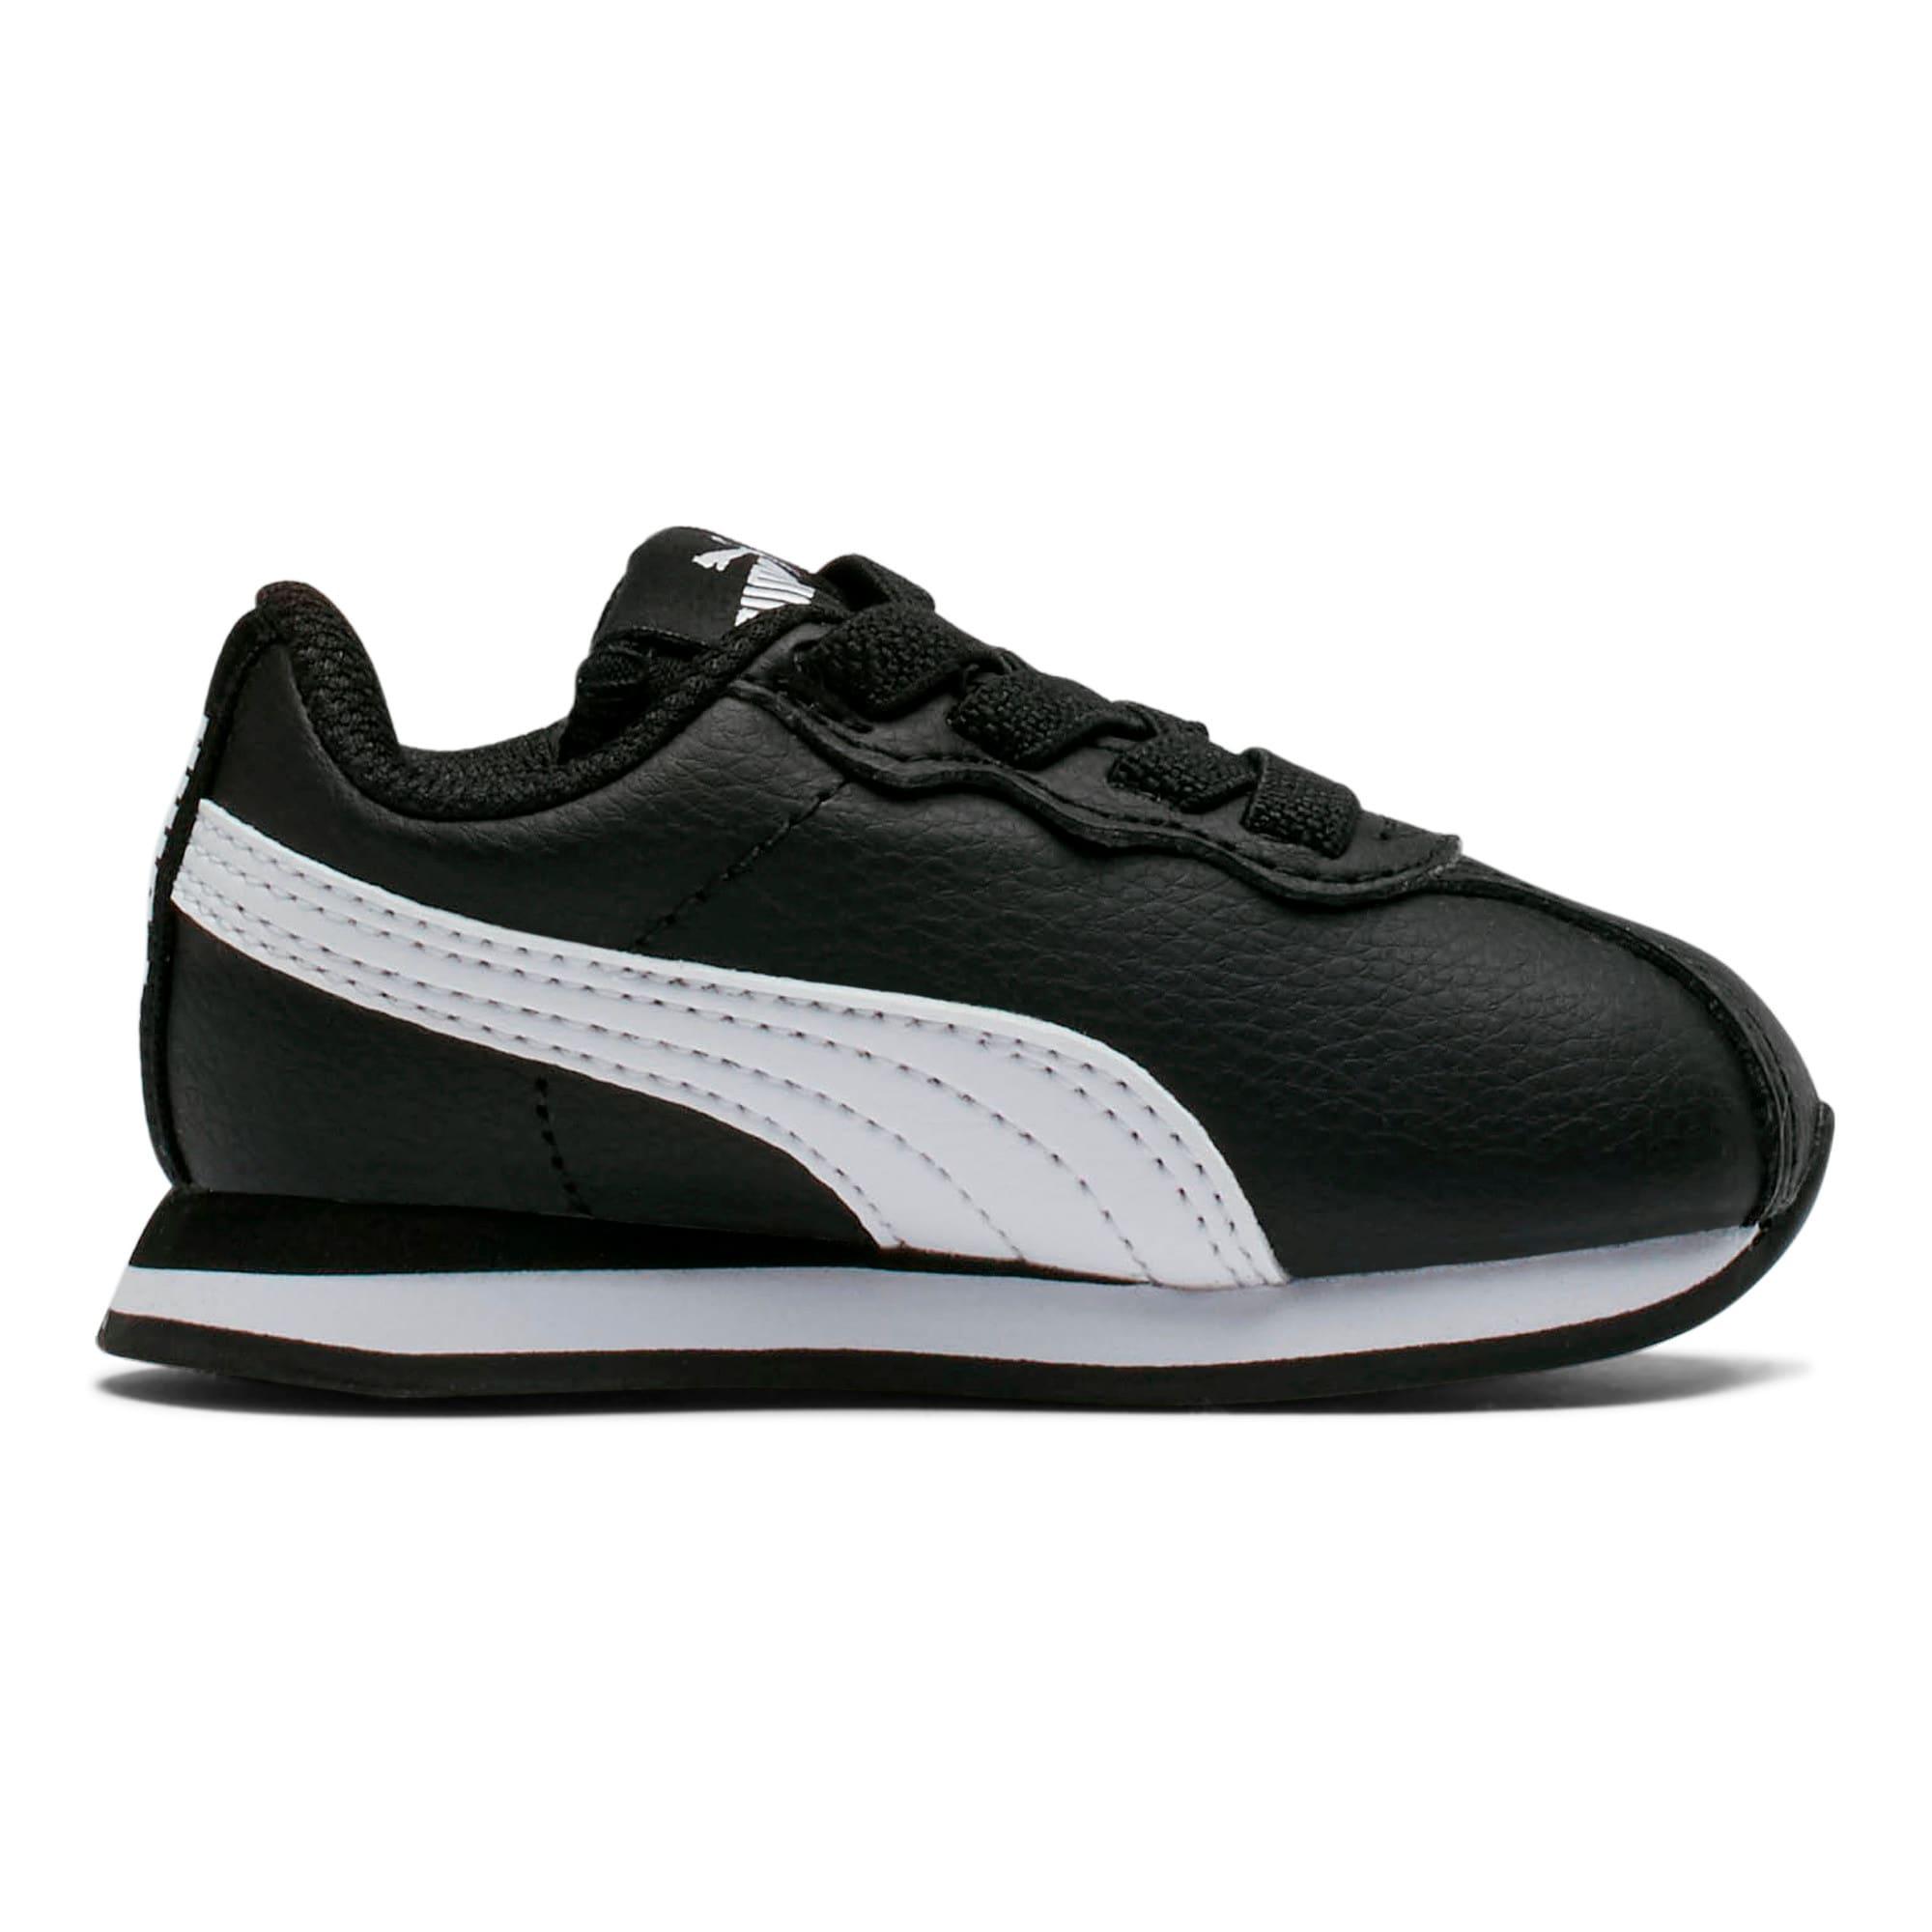 Thumbnail 5 of Turin II AC Toddler Shoes, Puma Black-Puma White, medium